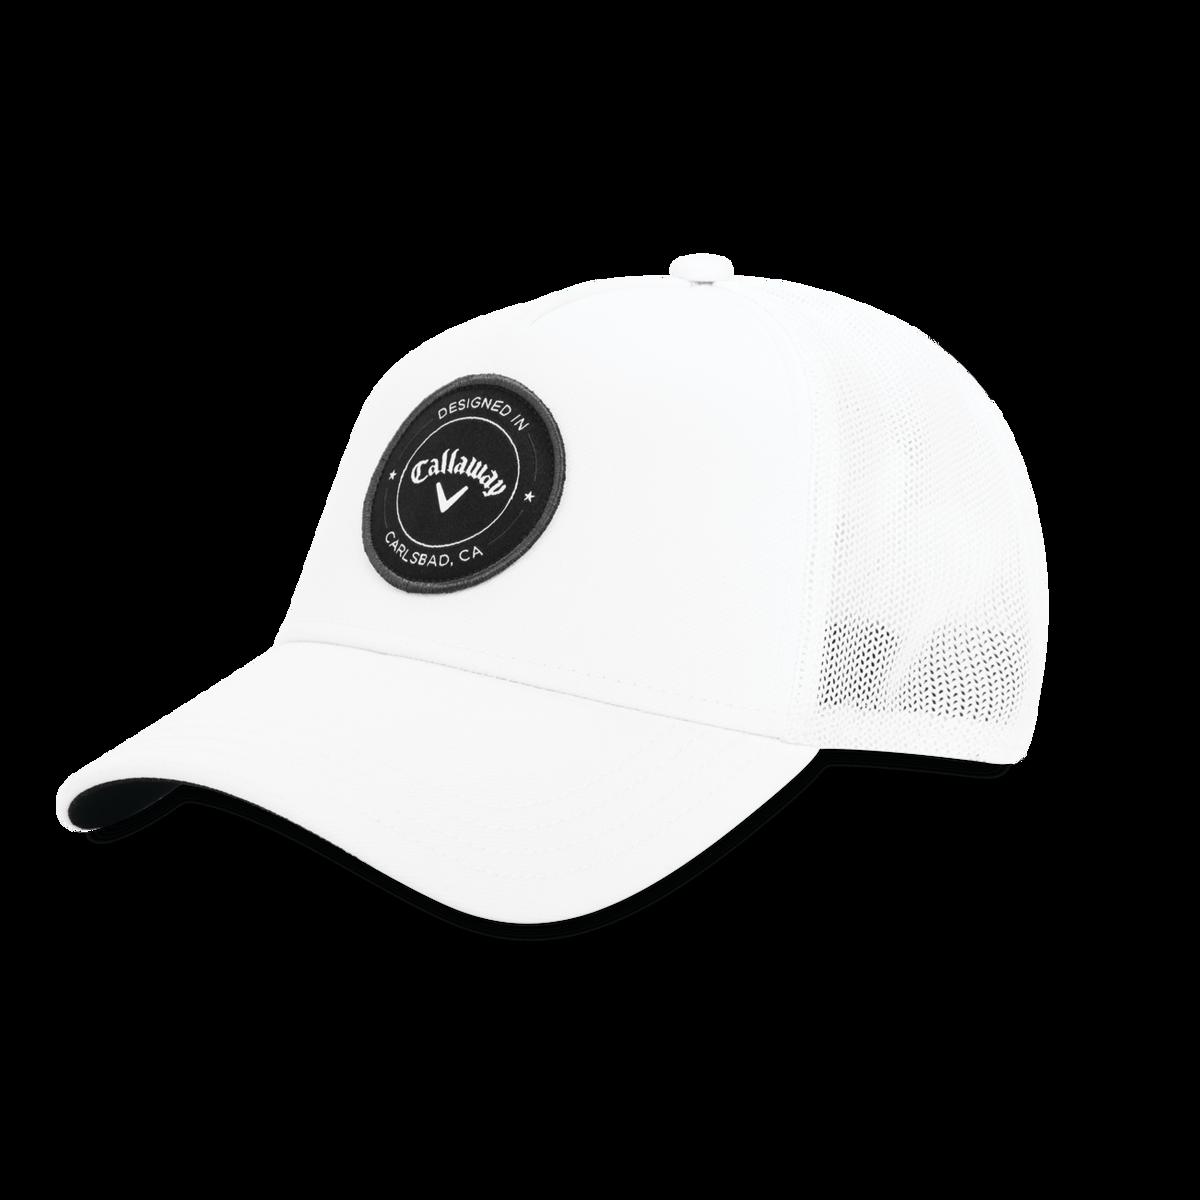 038964a7f419e Callaway Trucker Hat